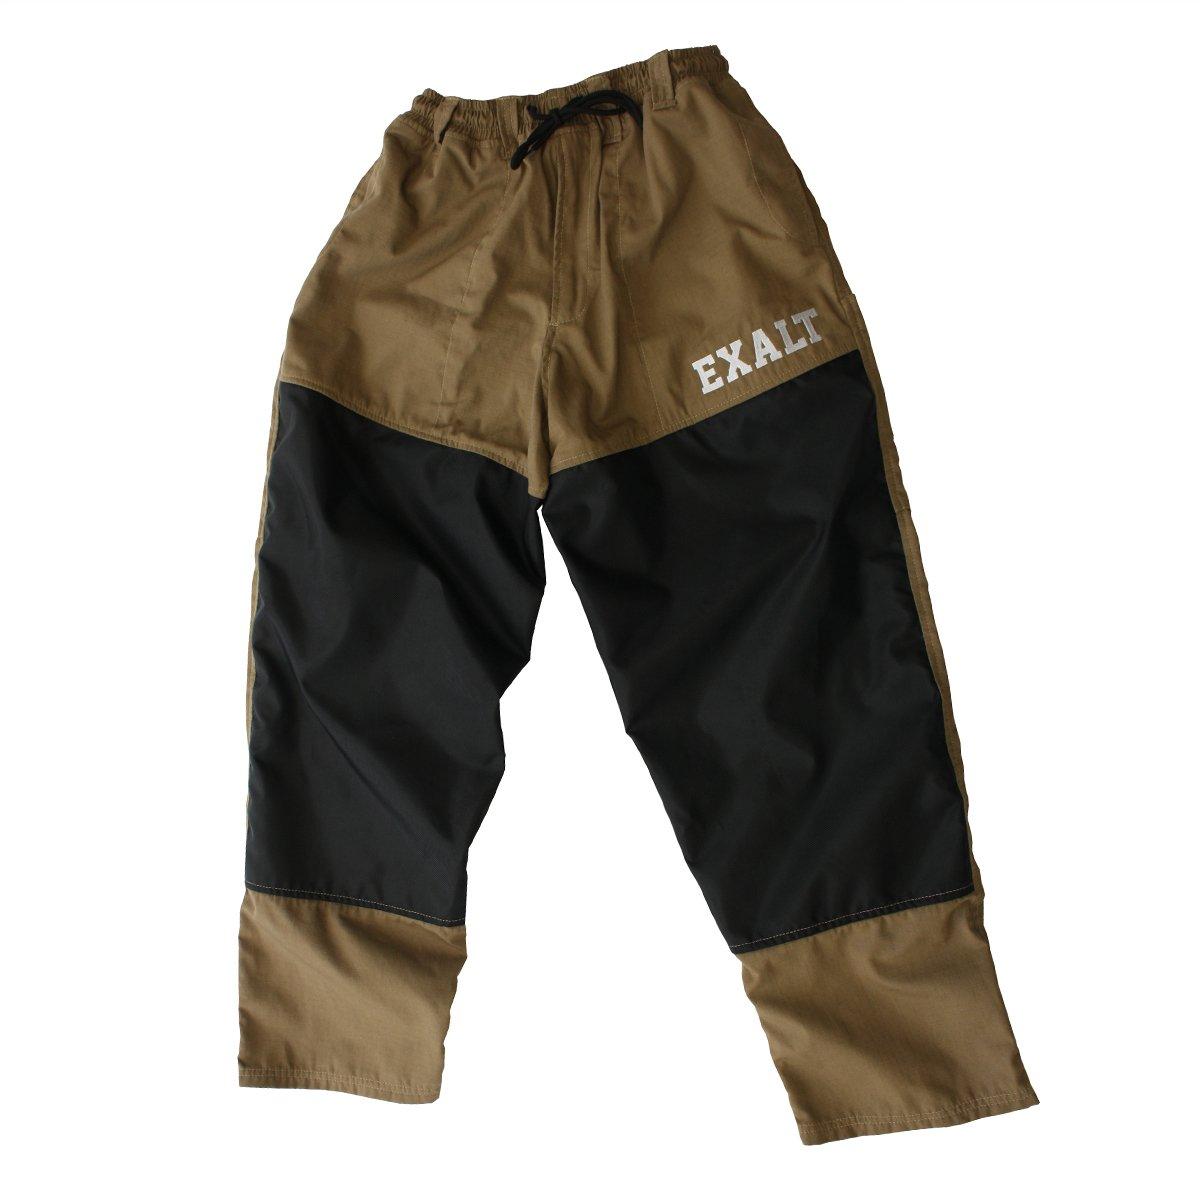 Exalt Paintball Throwback Paintball Pants - Tan - Small